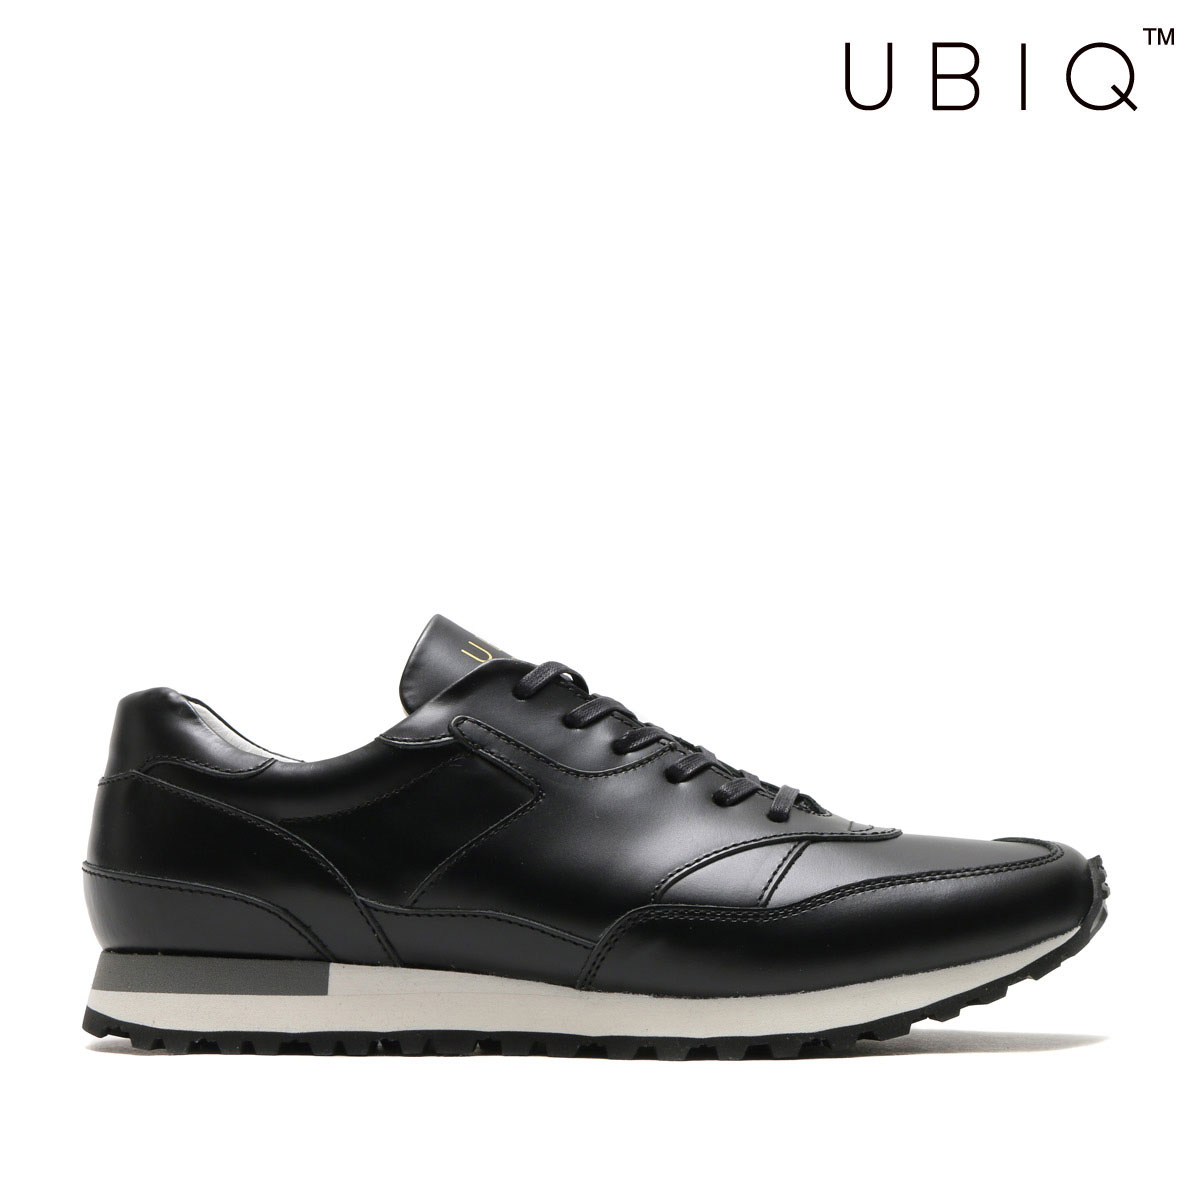 UBIQ SEED J(ユービック シード ジェイ)(BLACK)【メンズ】【スニーカー】【日本製】【17SU-I】